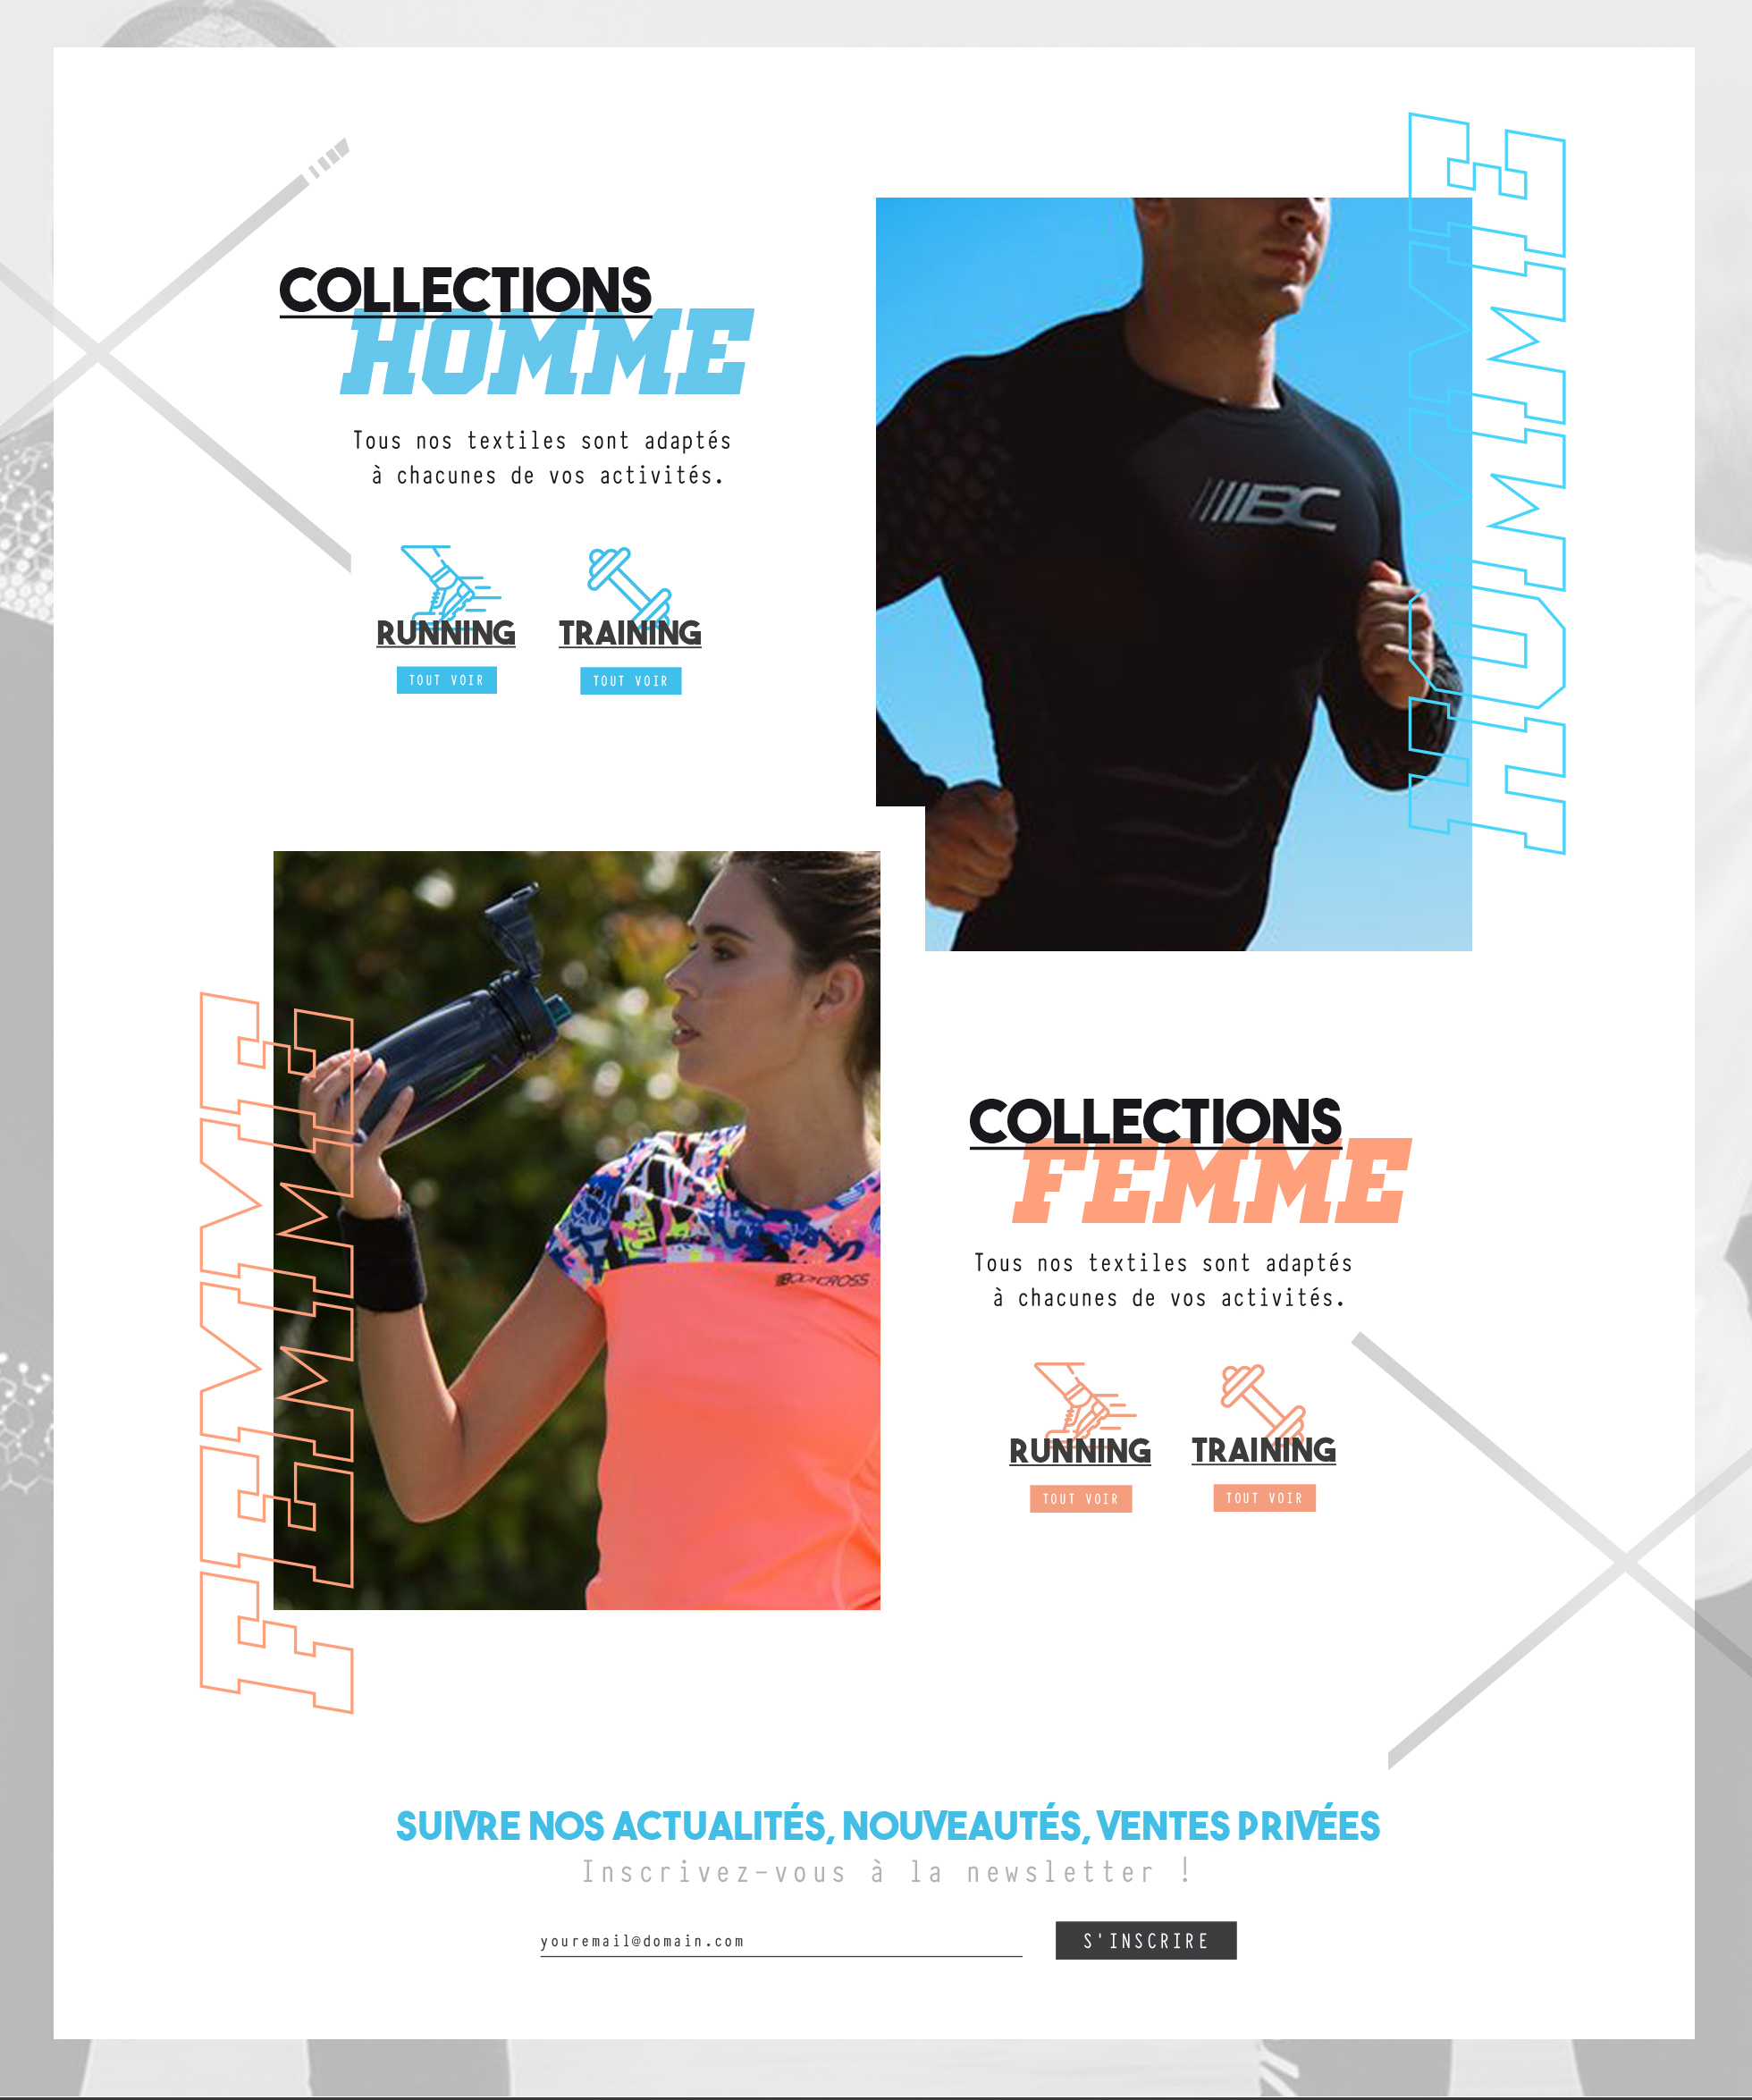 extrait webdesign Bodycross